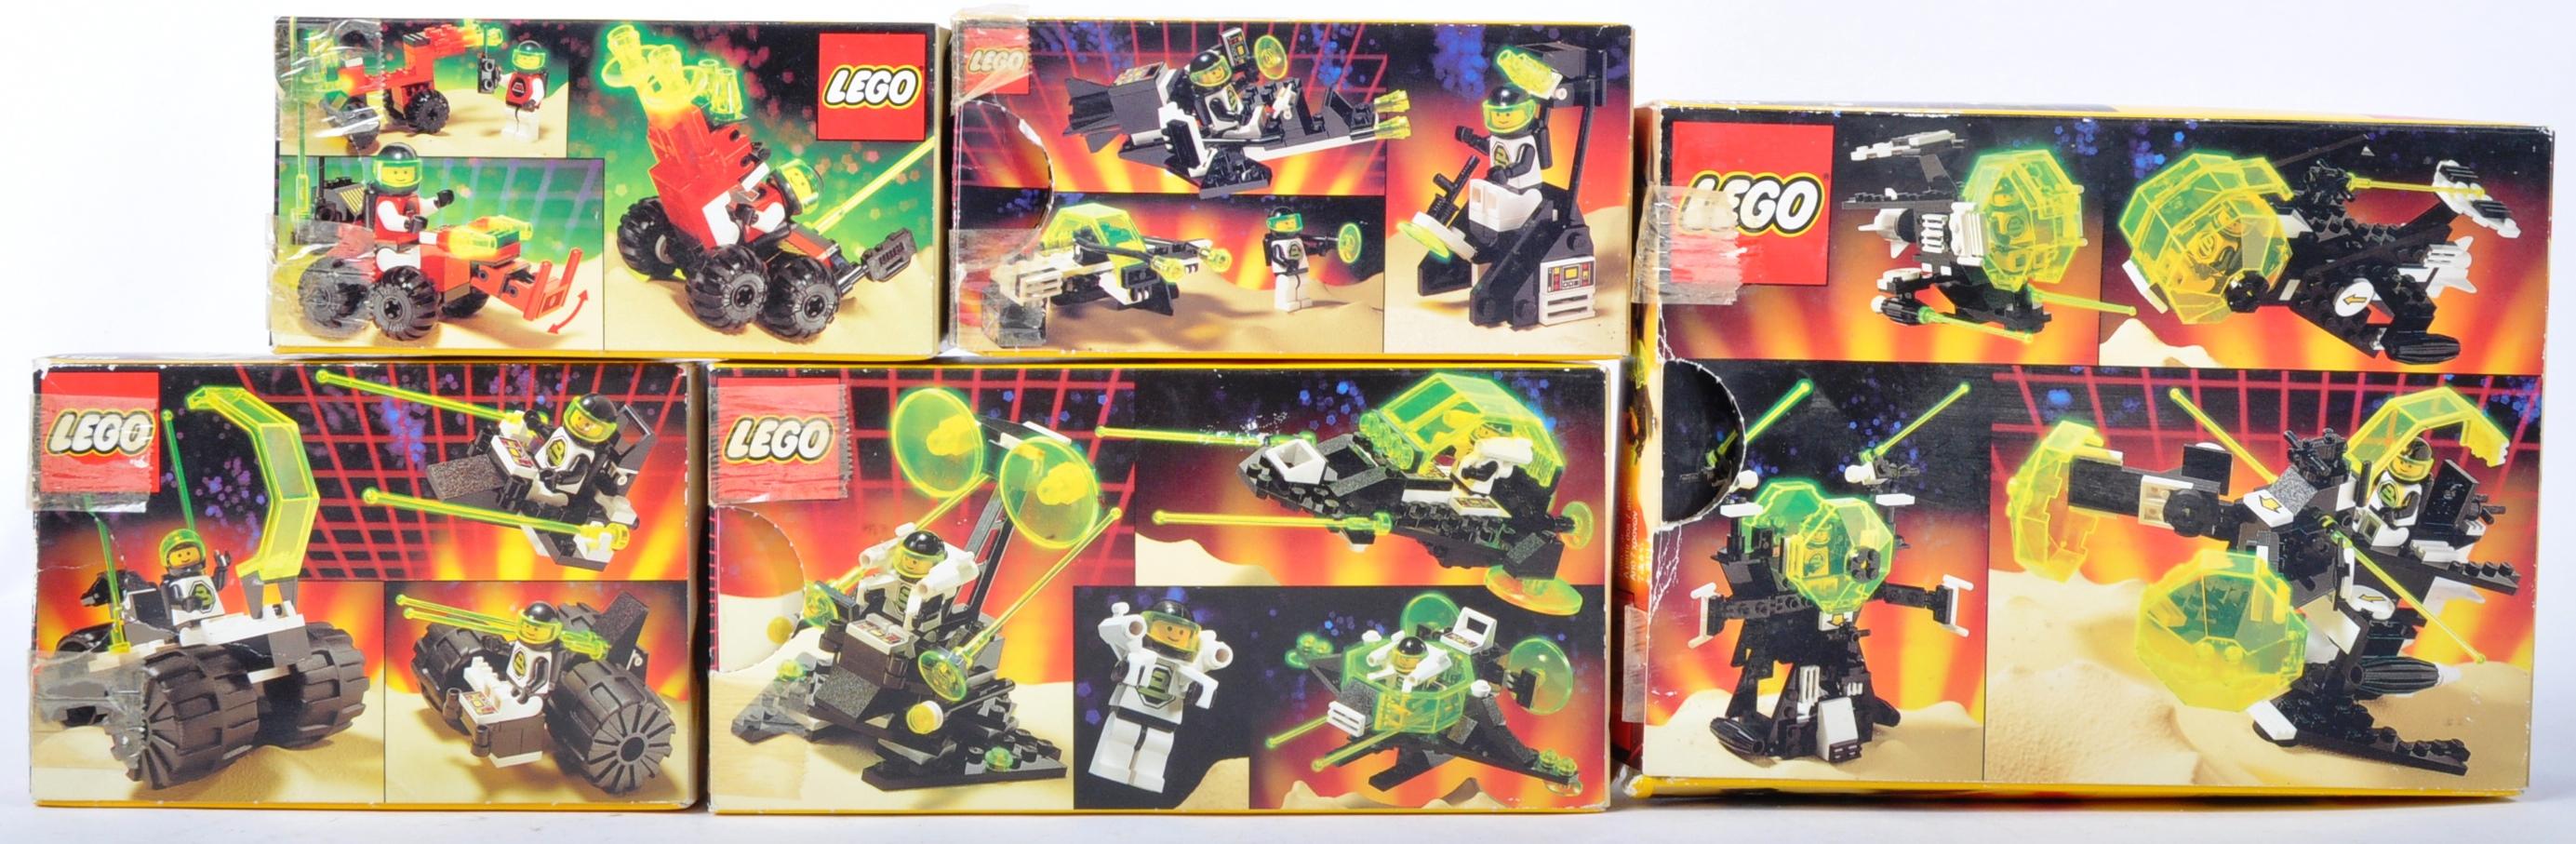 LEGO SETS - BLACKTRON - 6832 / 6833 / 6851 / 6878 / 6887 - Image 2 of 10